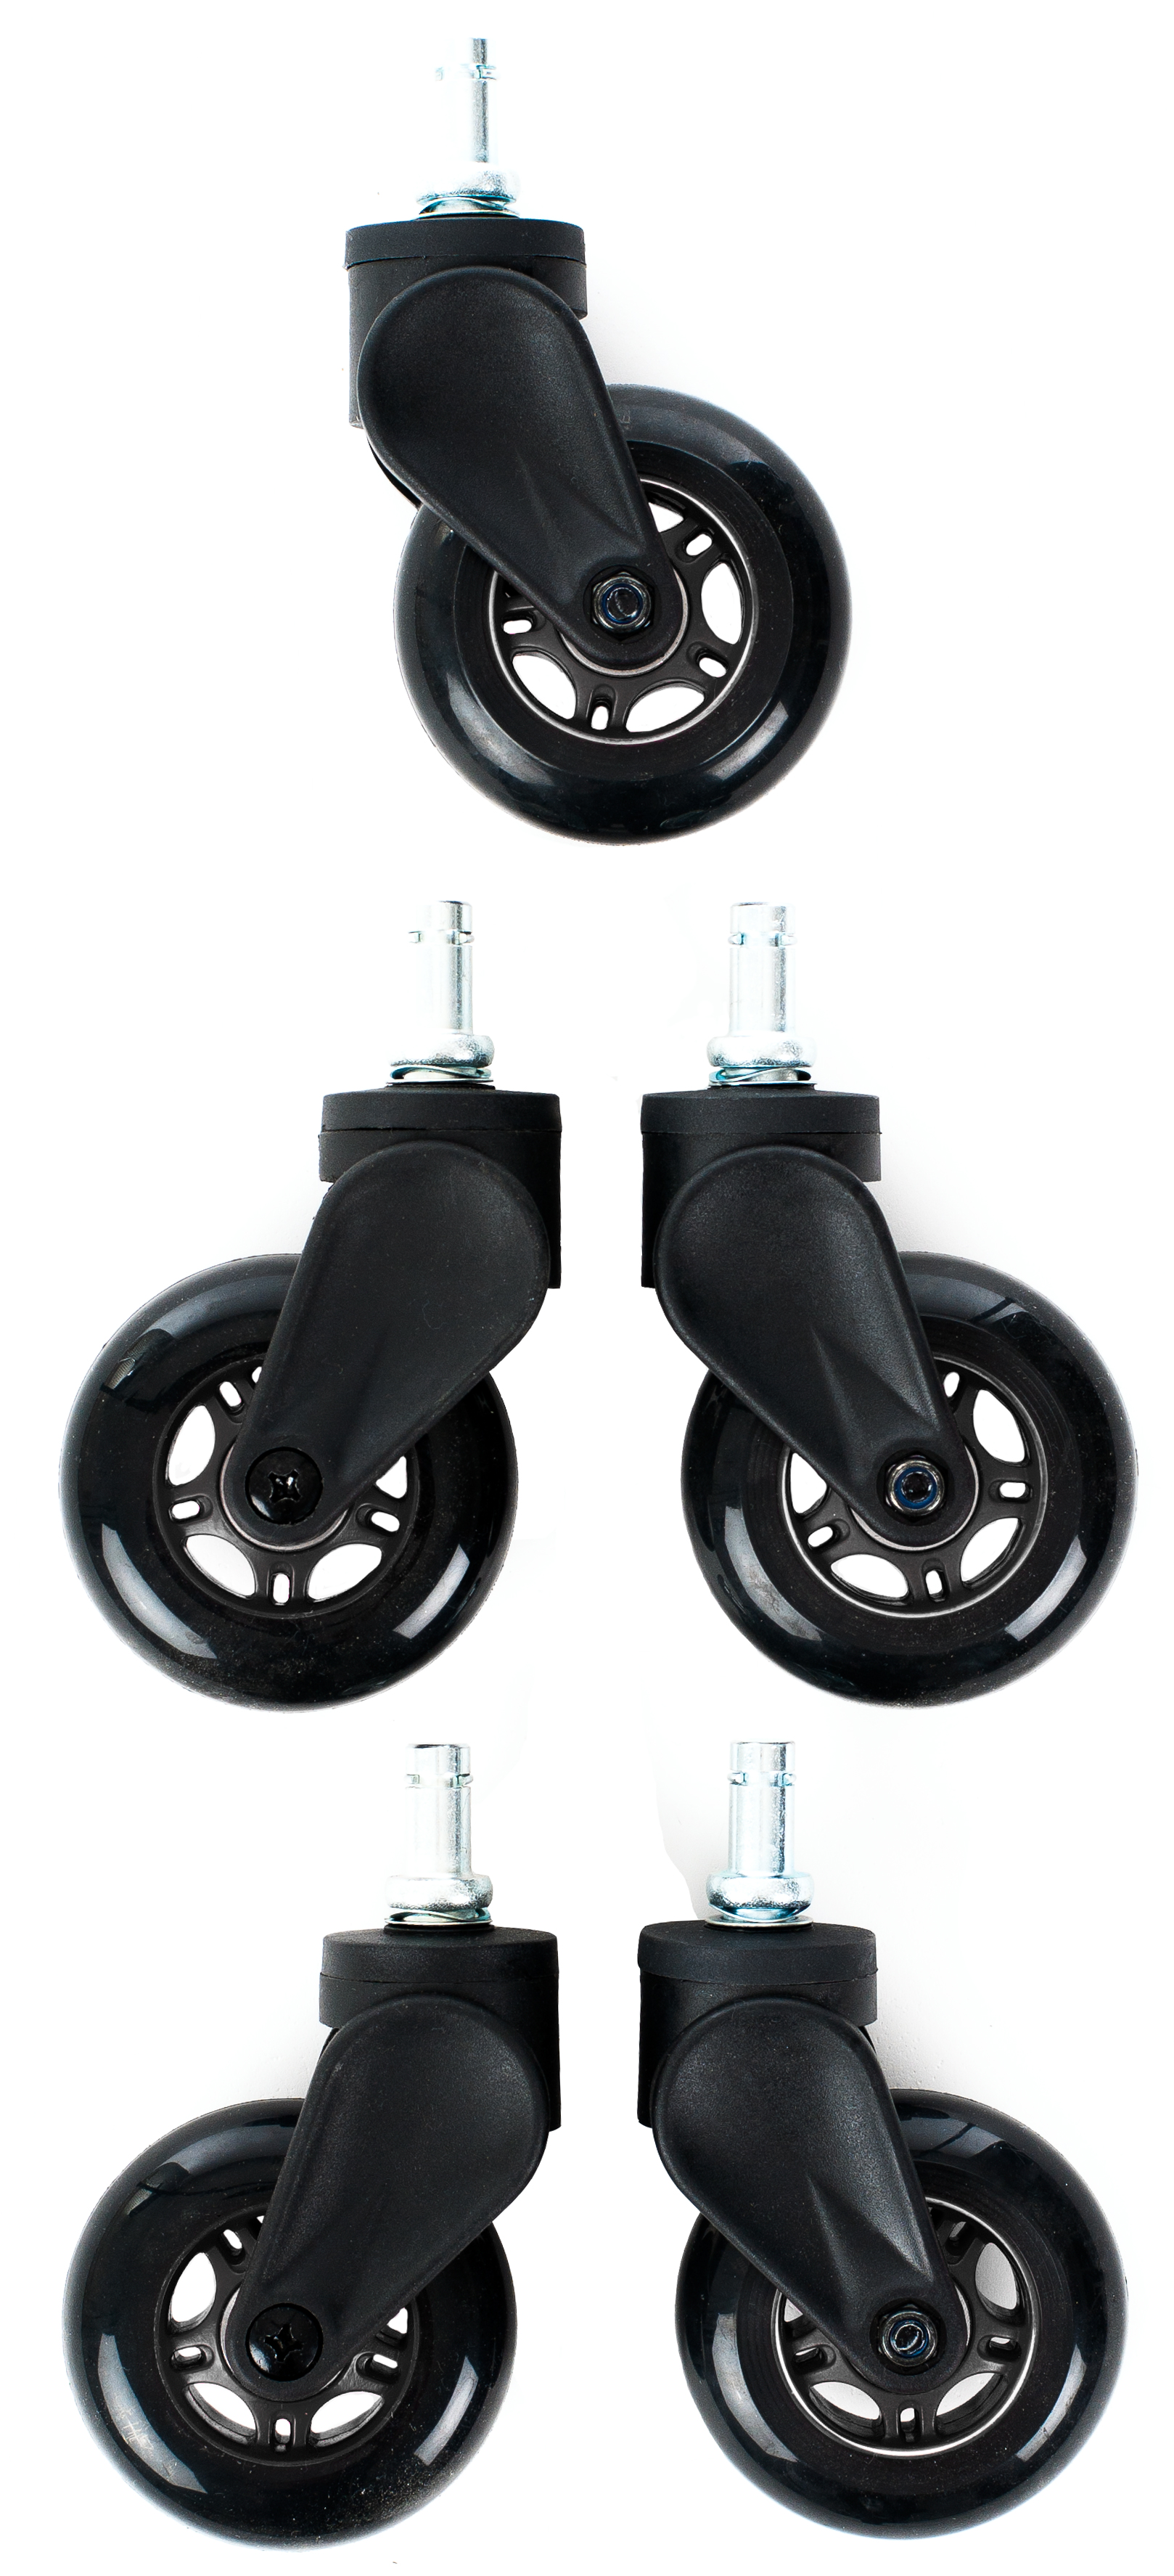 Dxracer Blade Wheels Black Gamegear Be Improve Your